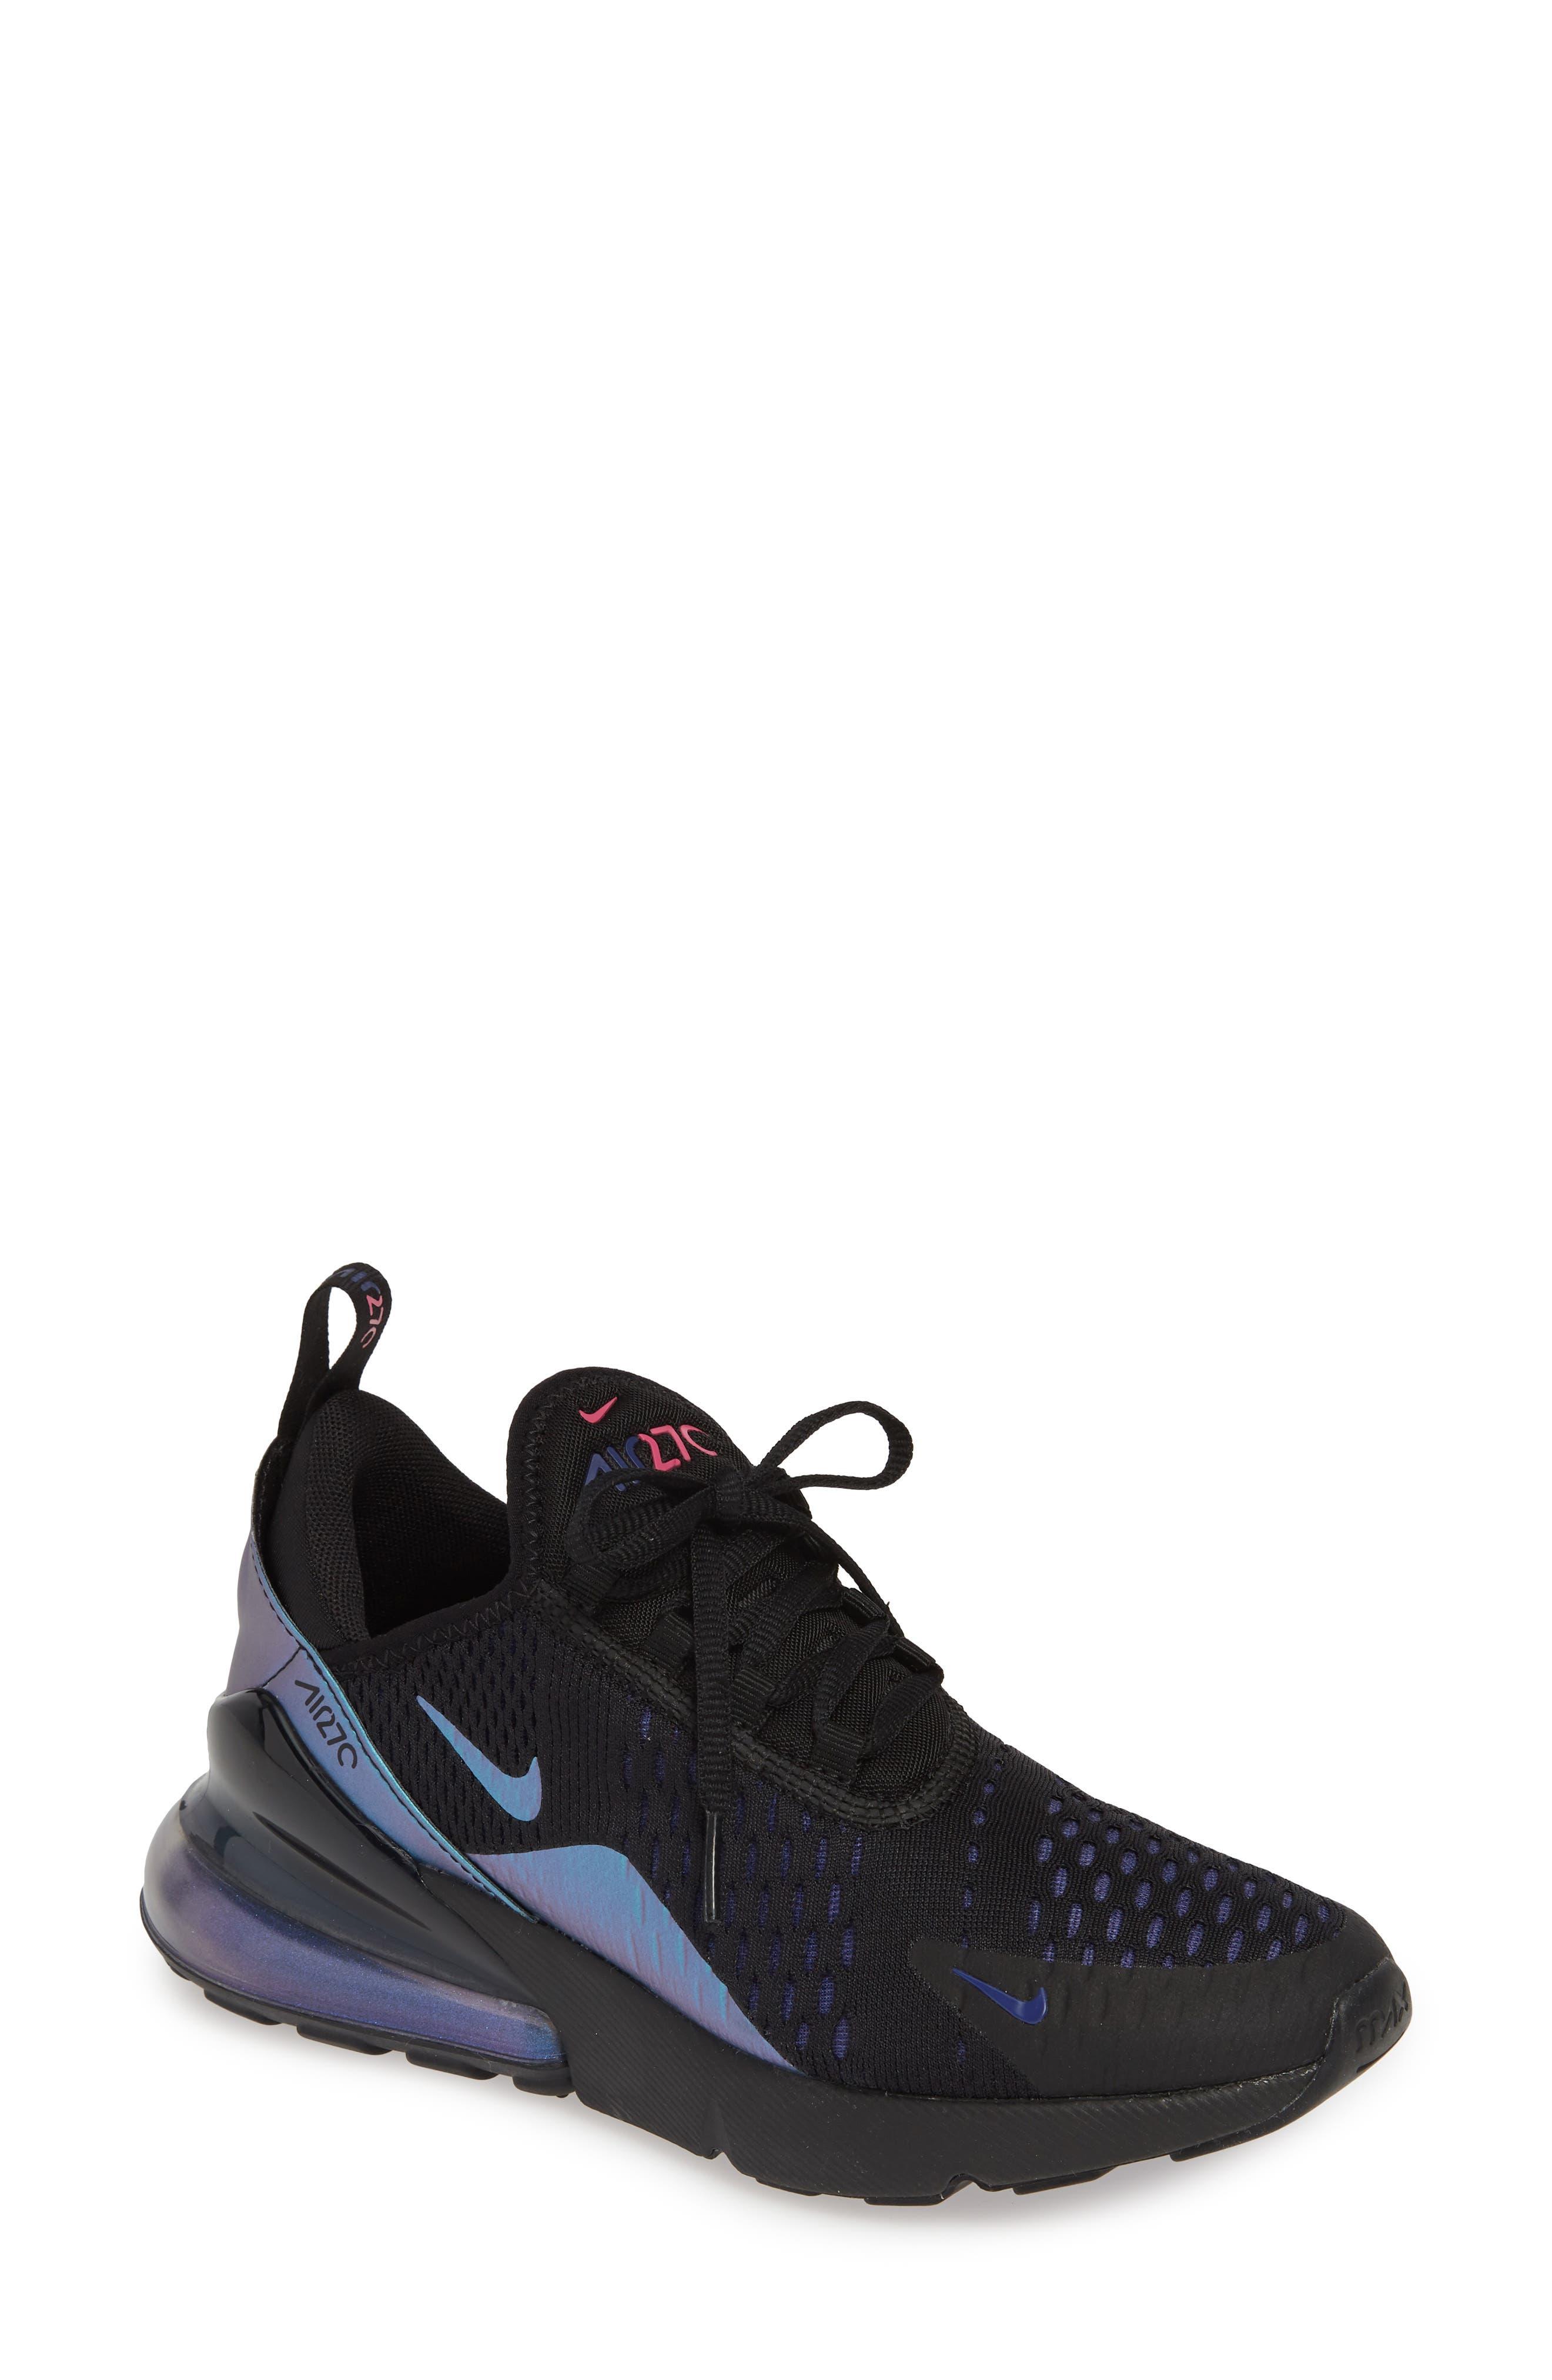 Air Max 270 Premium Sneaker, Main, color, BLACK/ FUCHSIA/ PURPLE